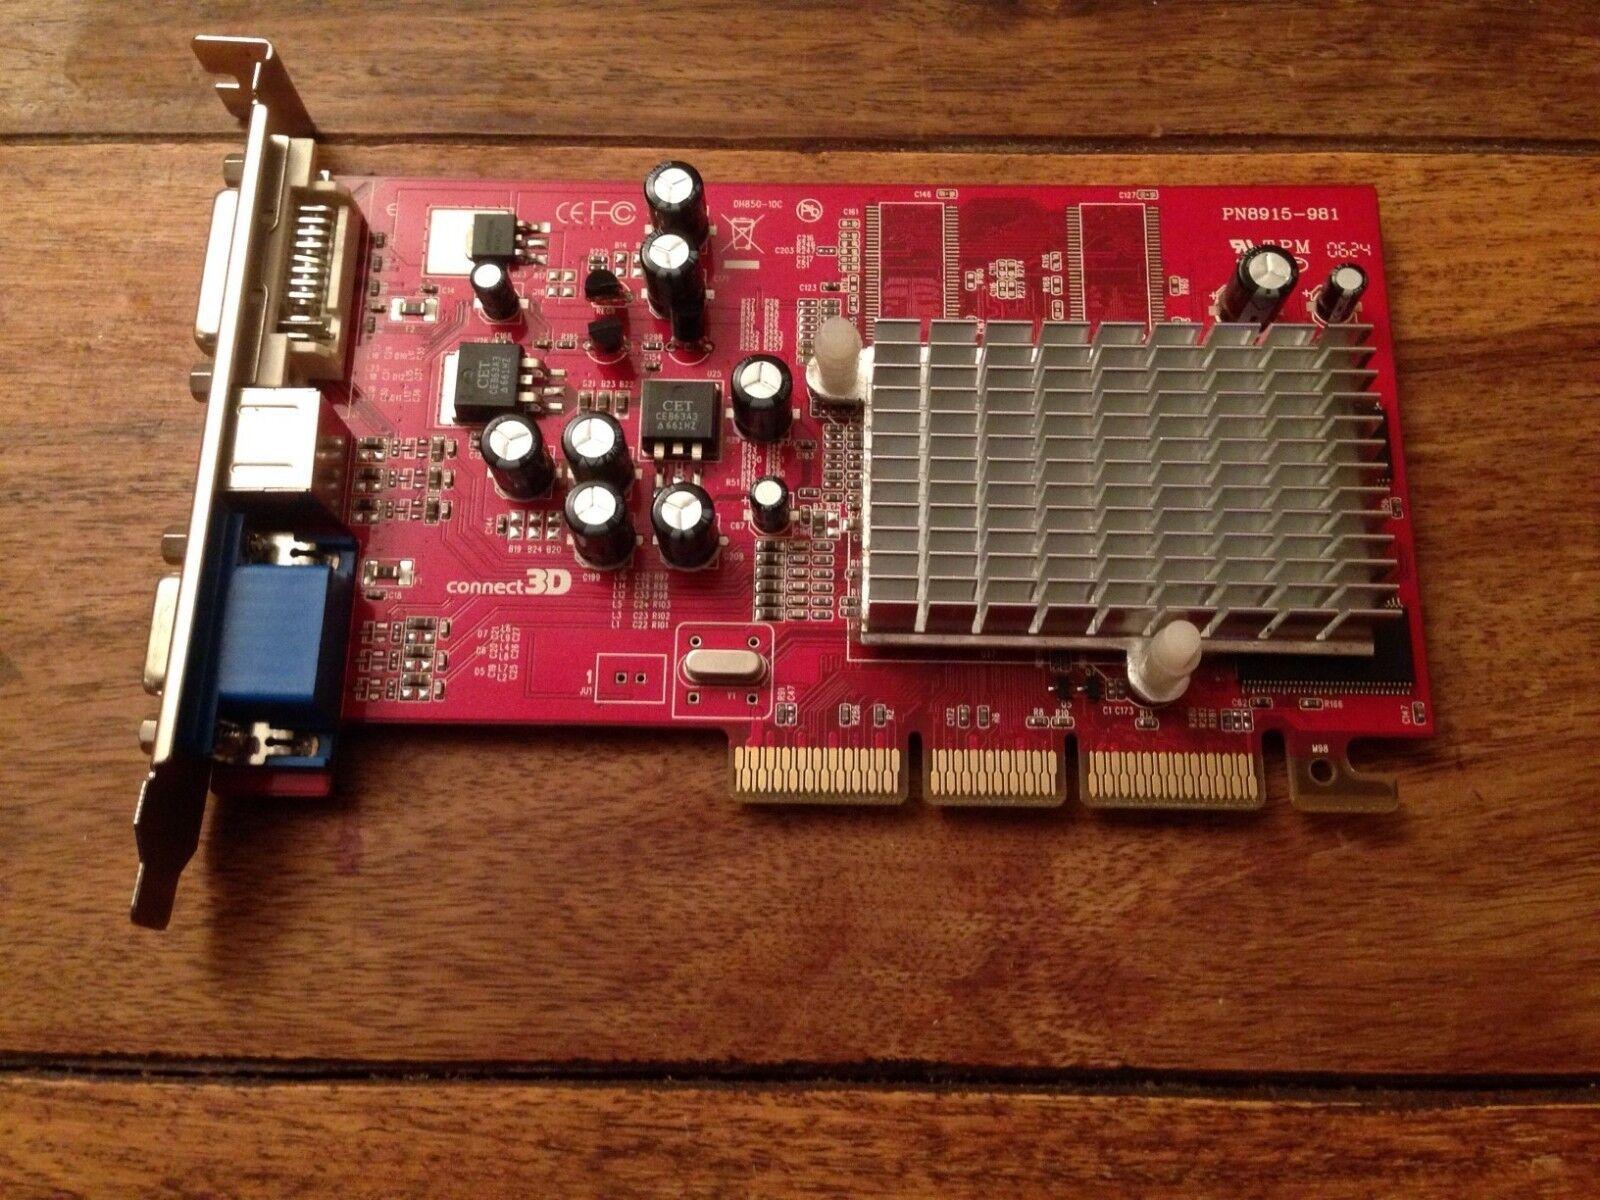 ATI Radeon SAPPHIRE 9250 SE DDR TV DVI 128MB Graphic Video Card GPU DVI VGA